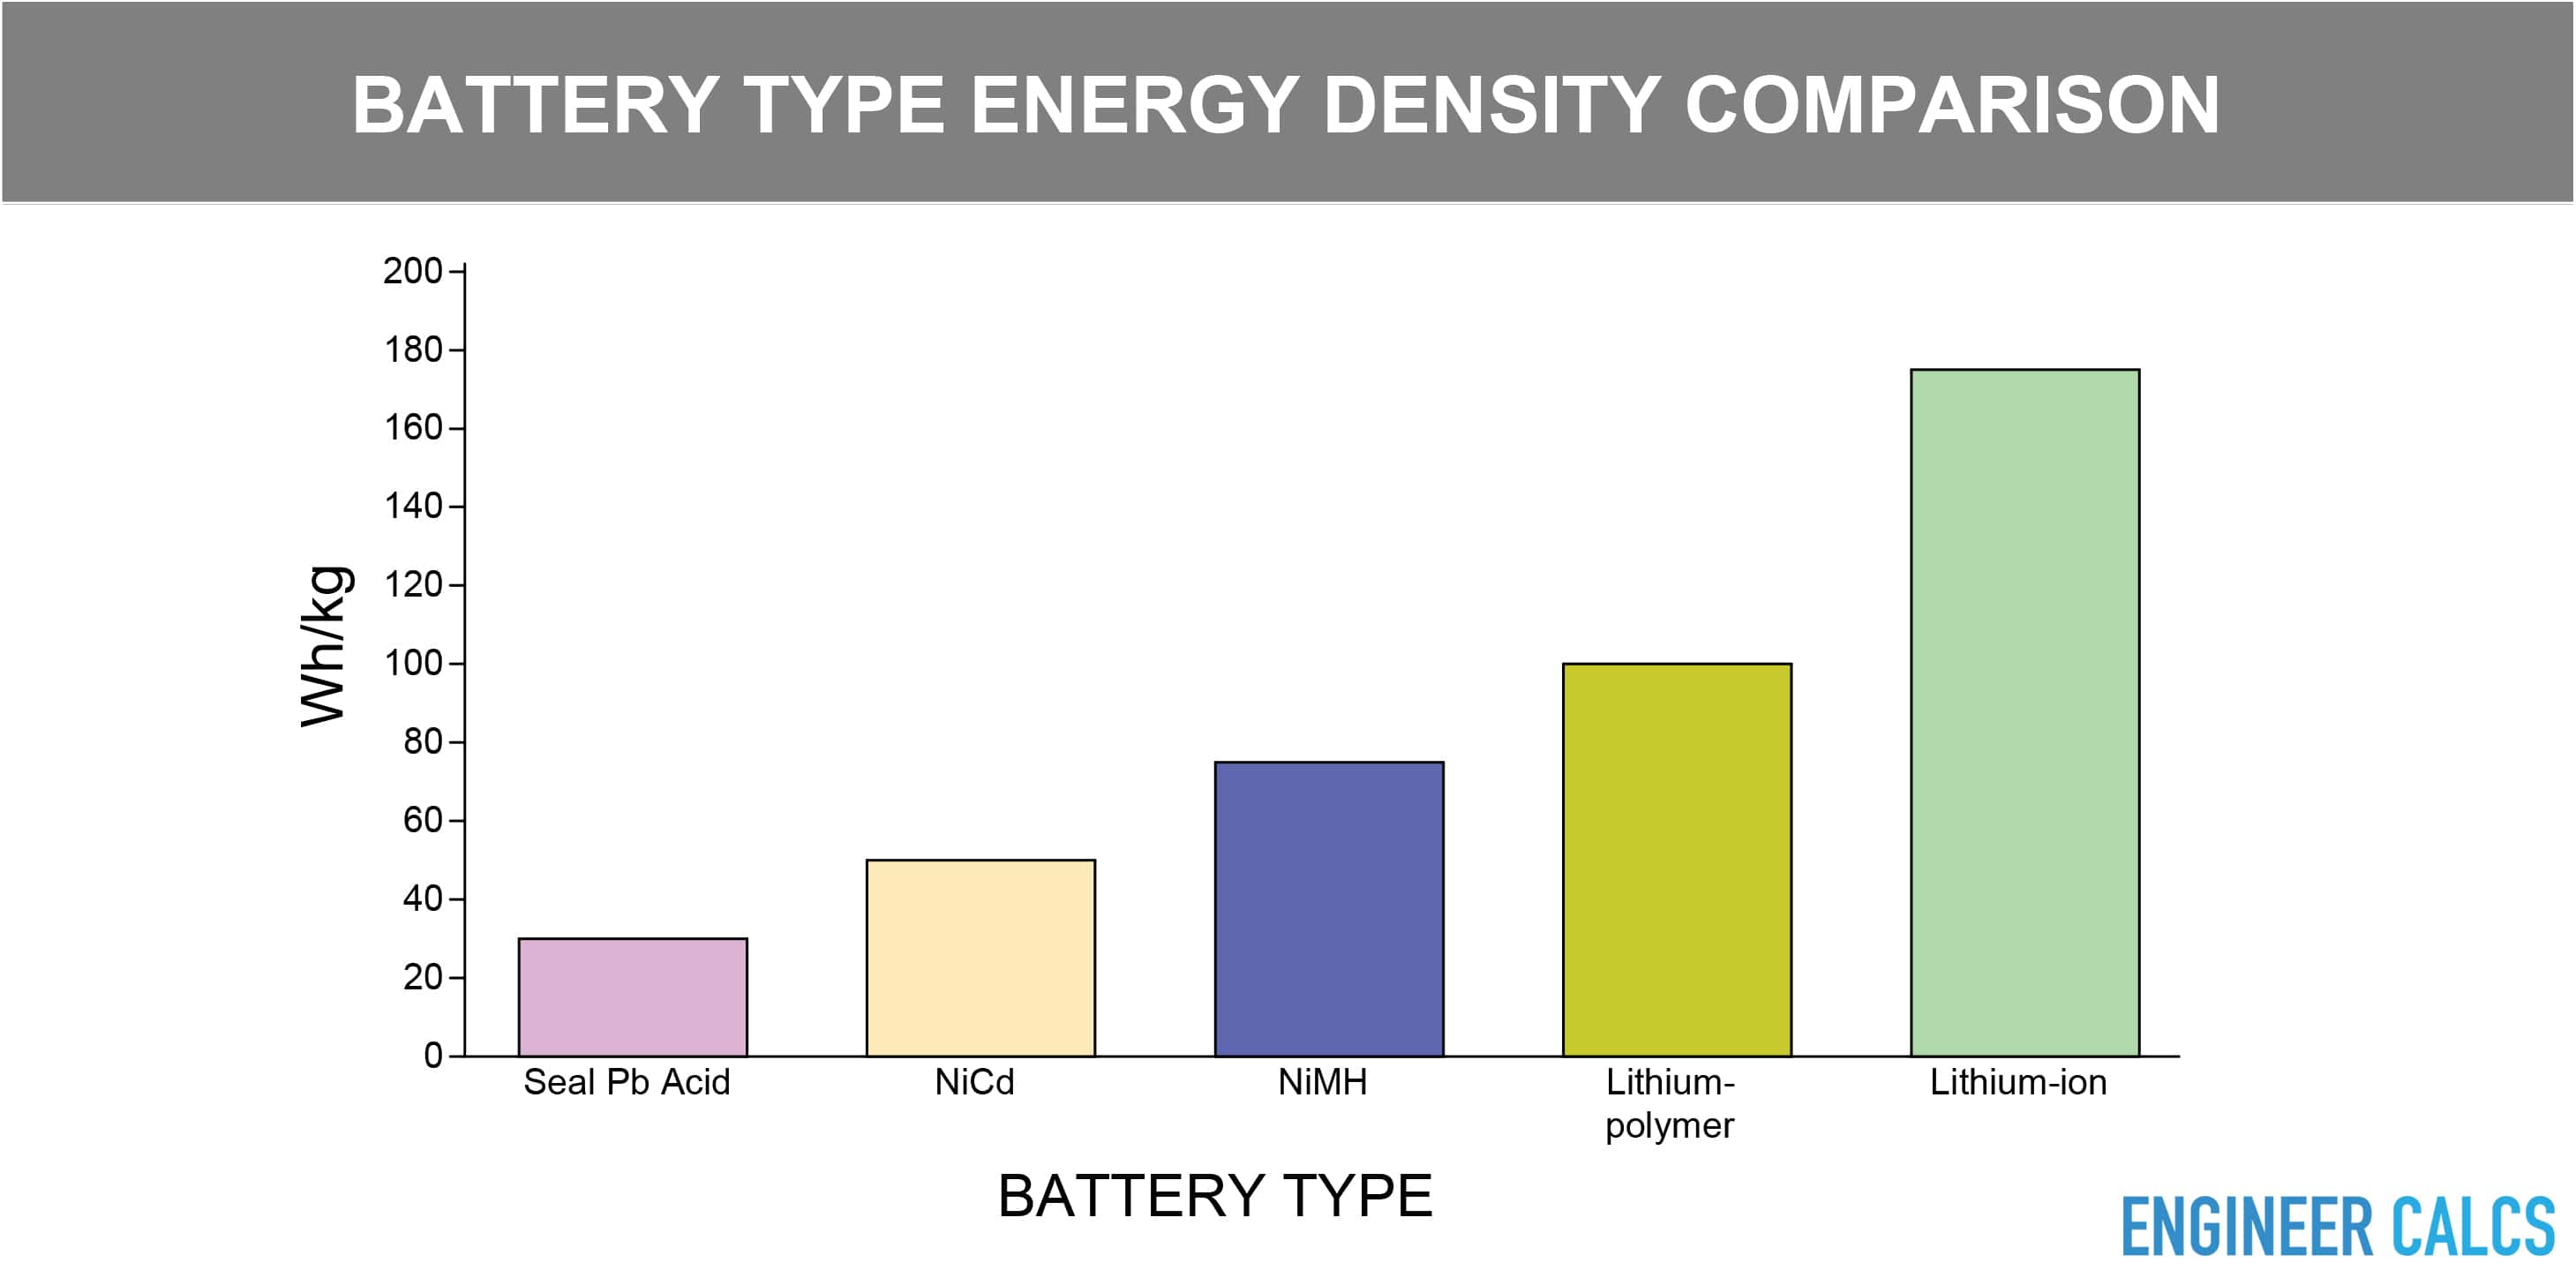 Battery type energy density comparison bar graph